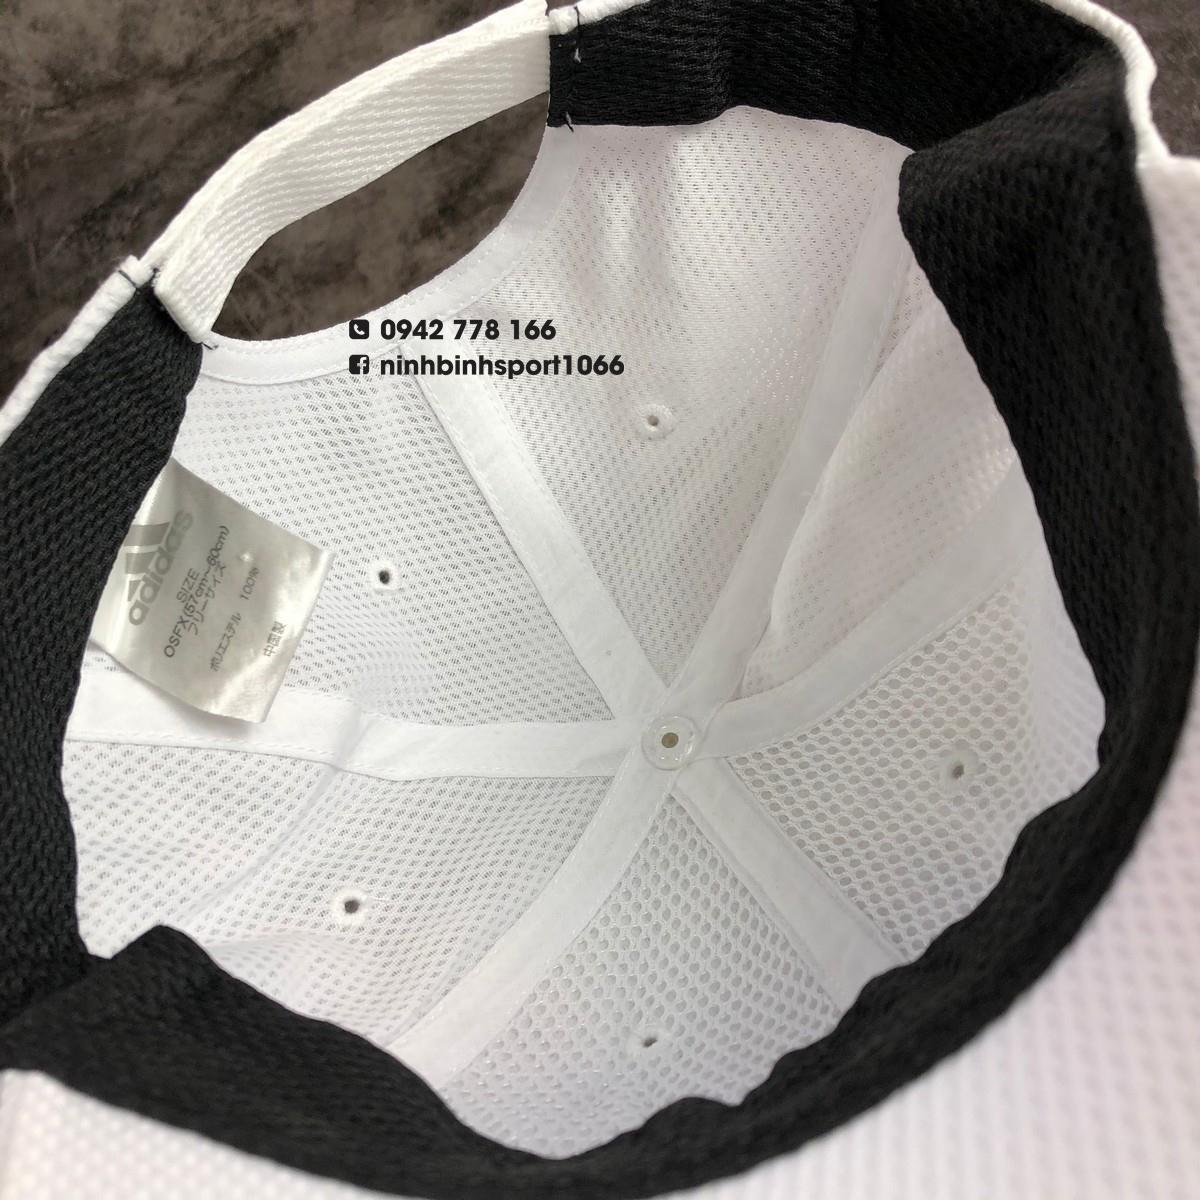 Mũ thể thao Adidas 516-06-OSFX